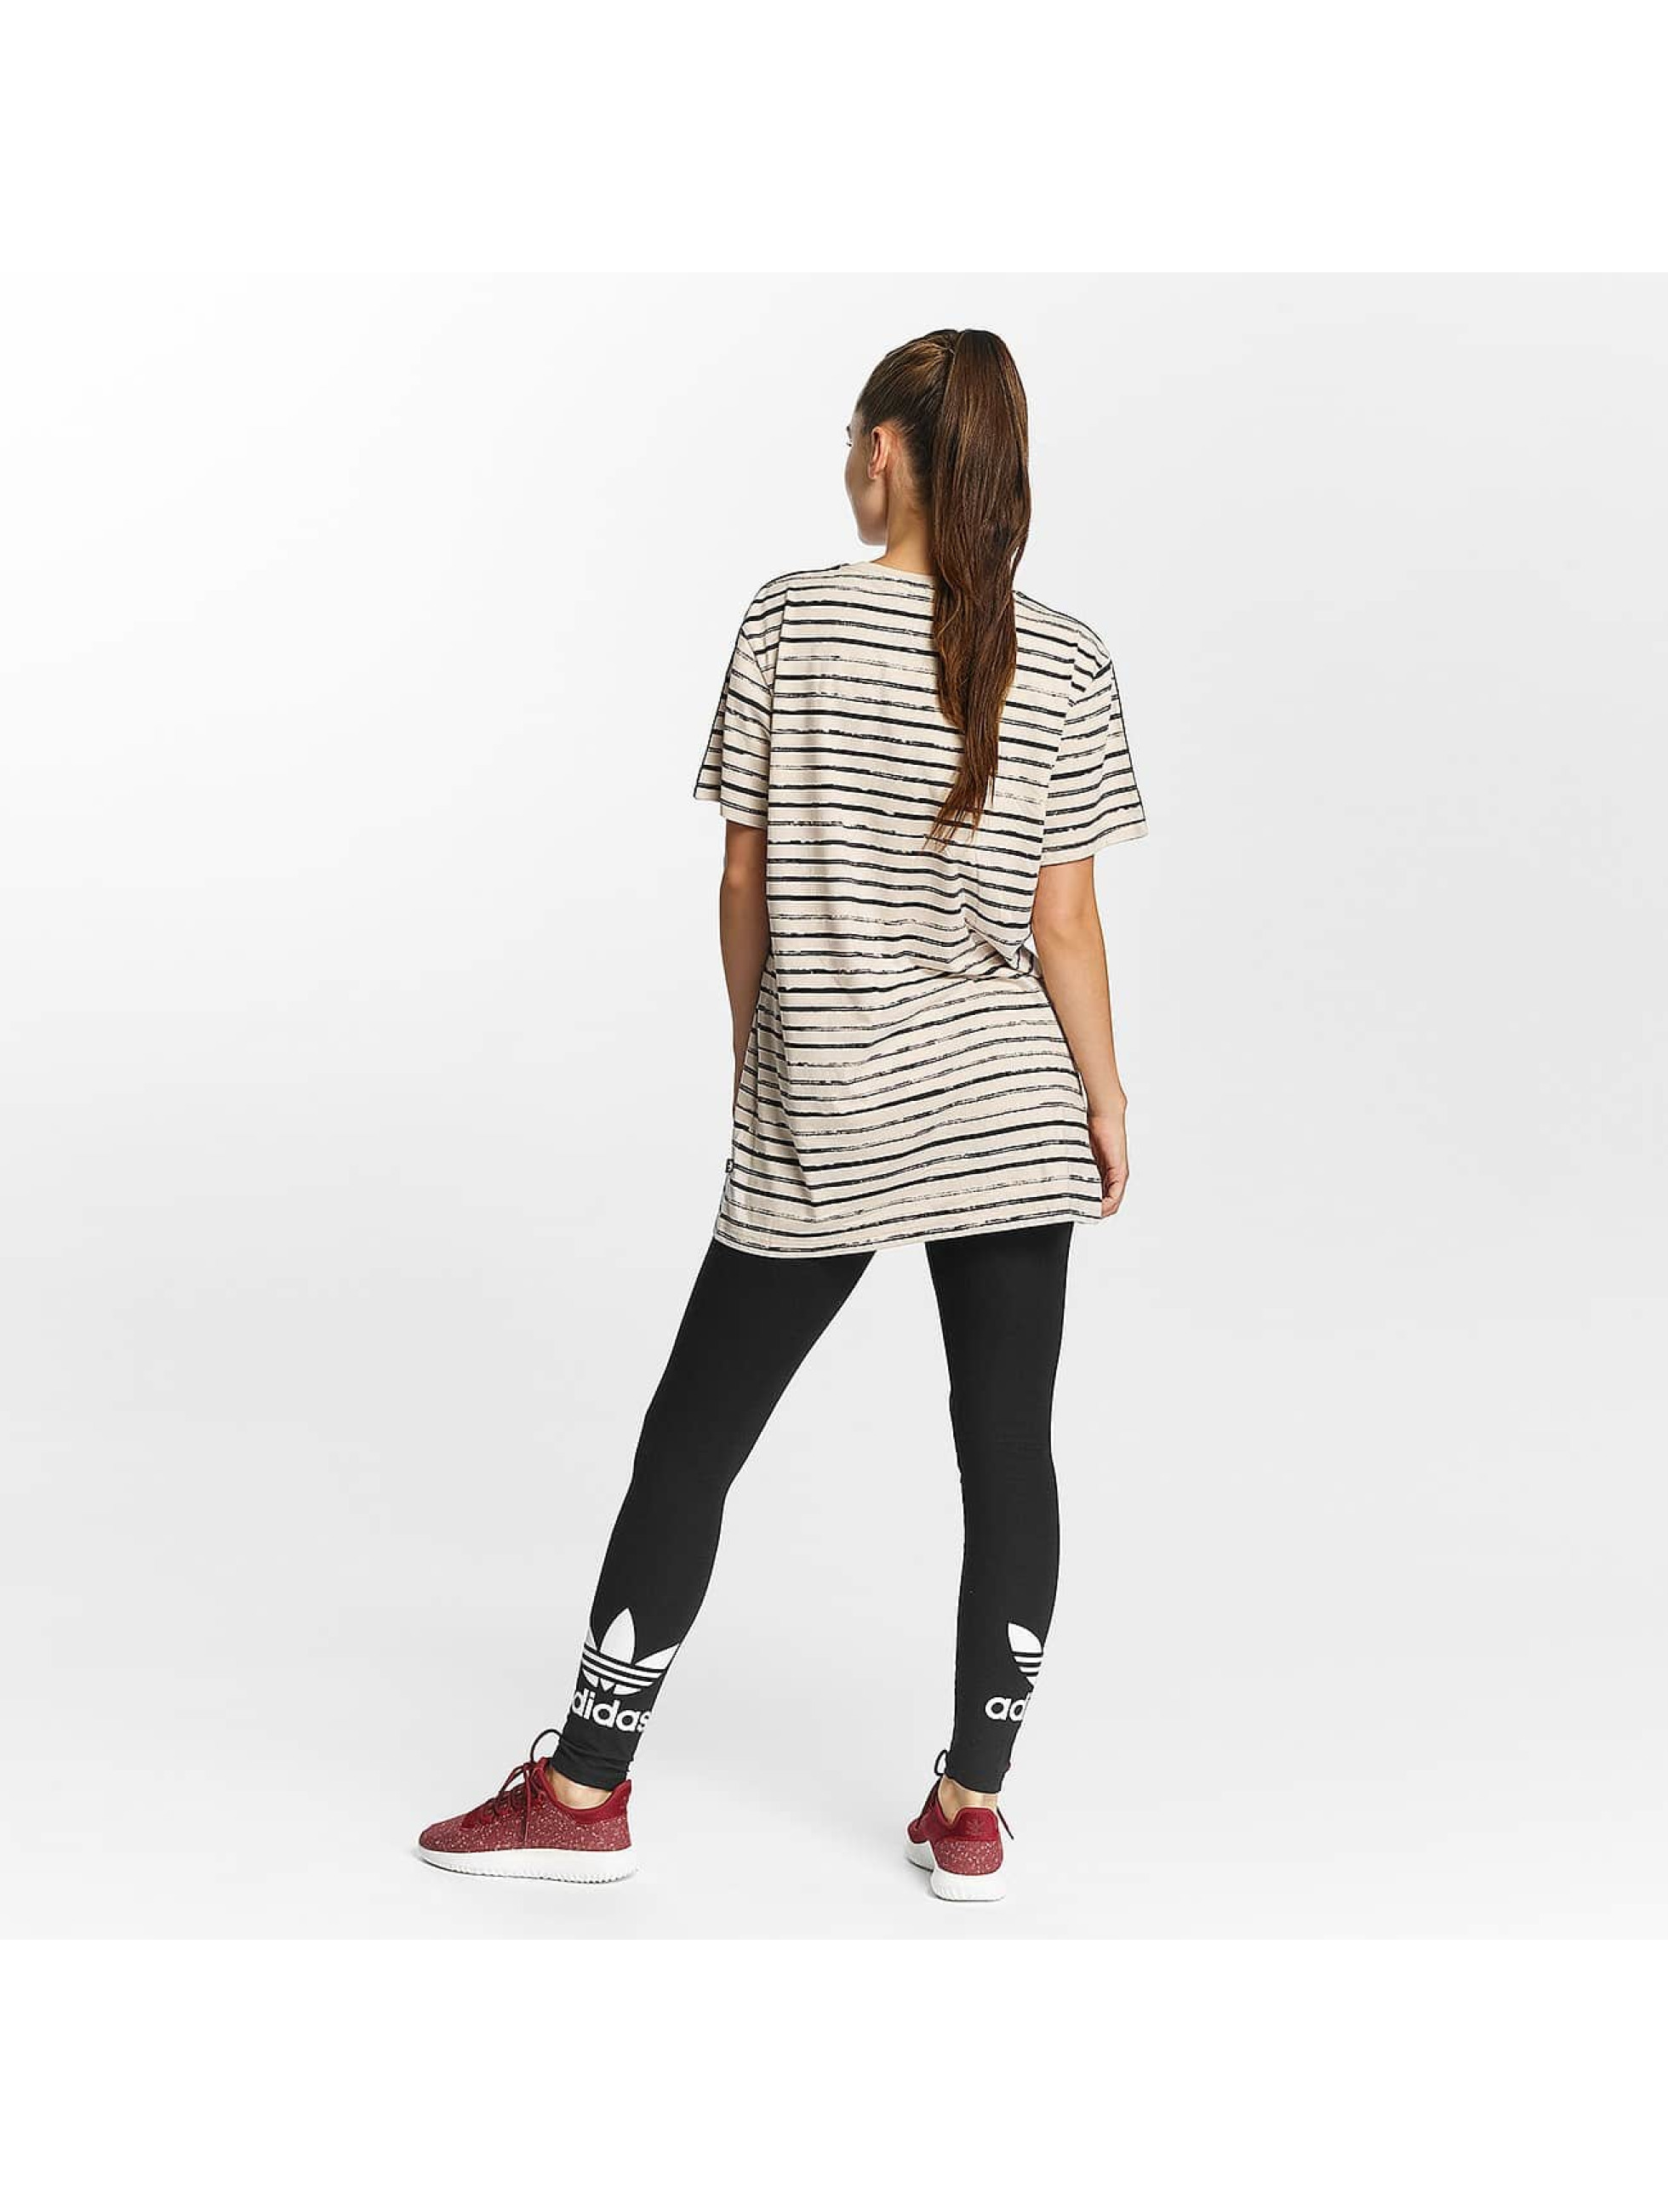 adidas T-shirt Marie Antoinette marrone